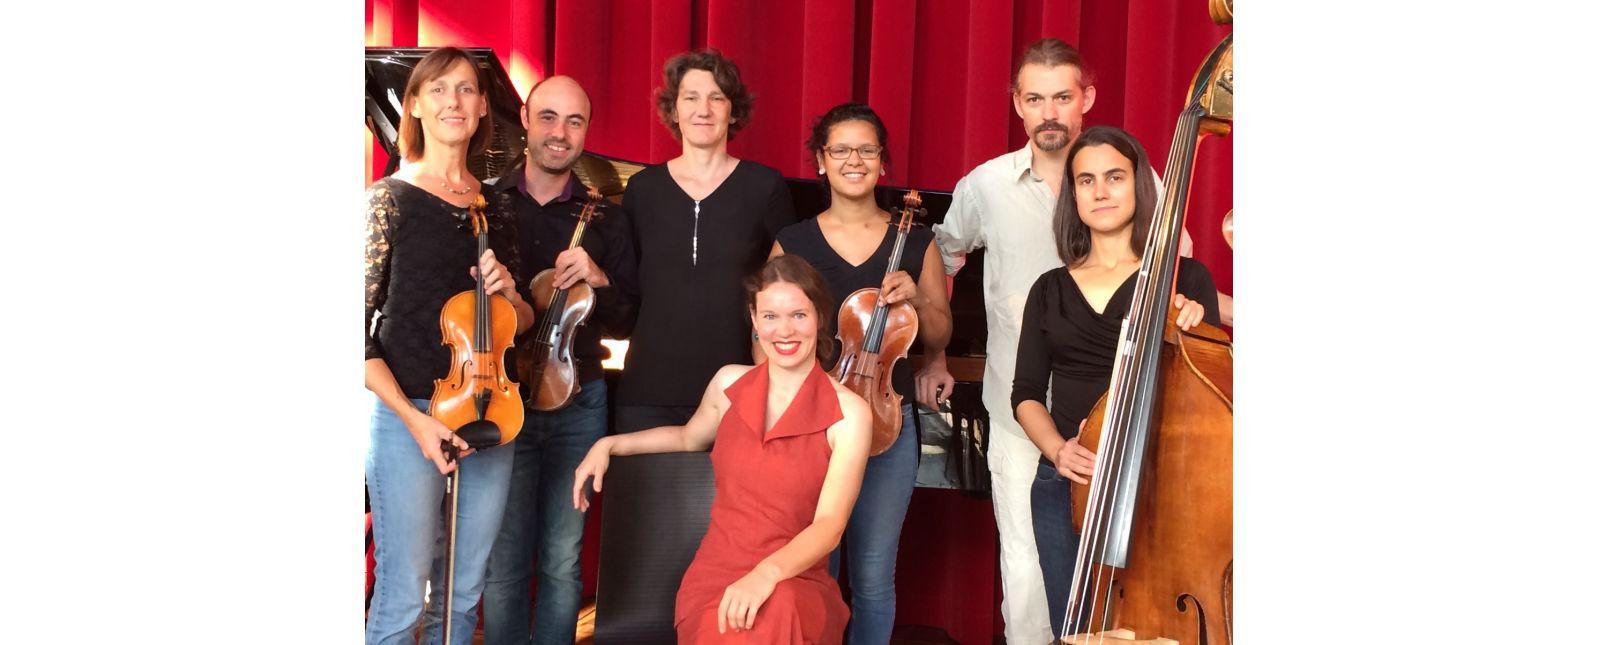 Ensemble des Kammerkonzerts //  Theater Freiburg / 2018